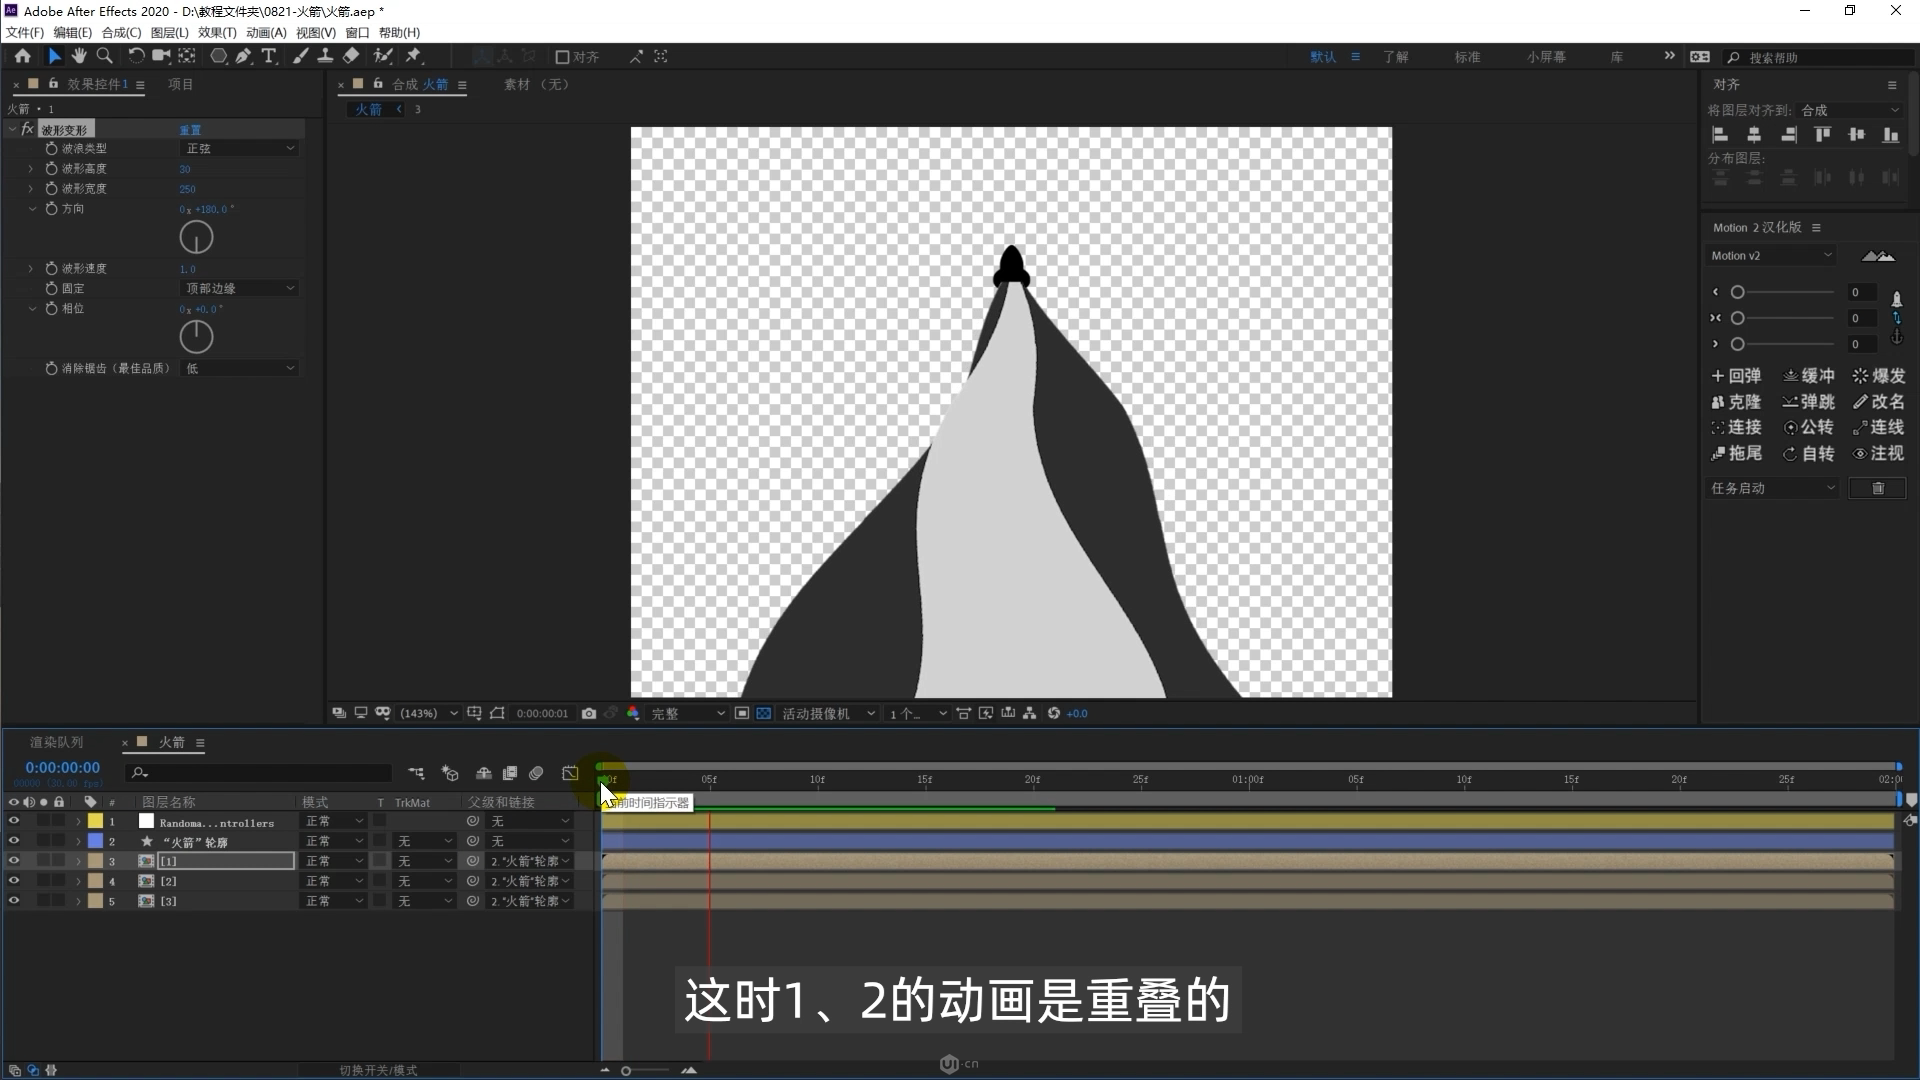 AE如何制作简单的太空旅行MG动画(8)